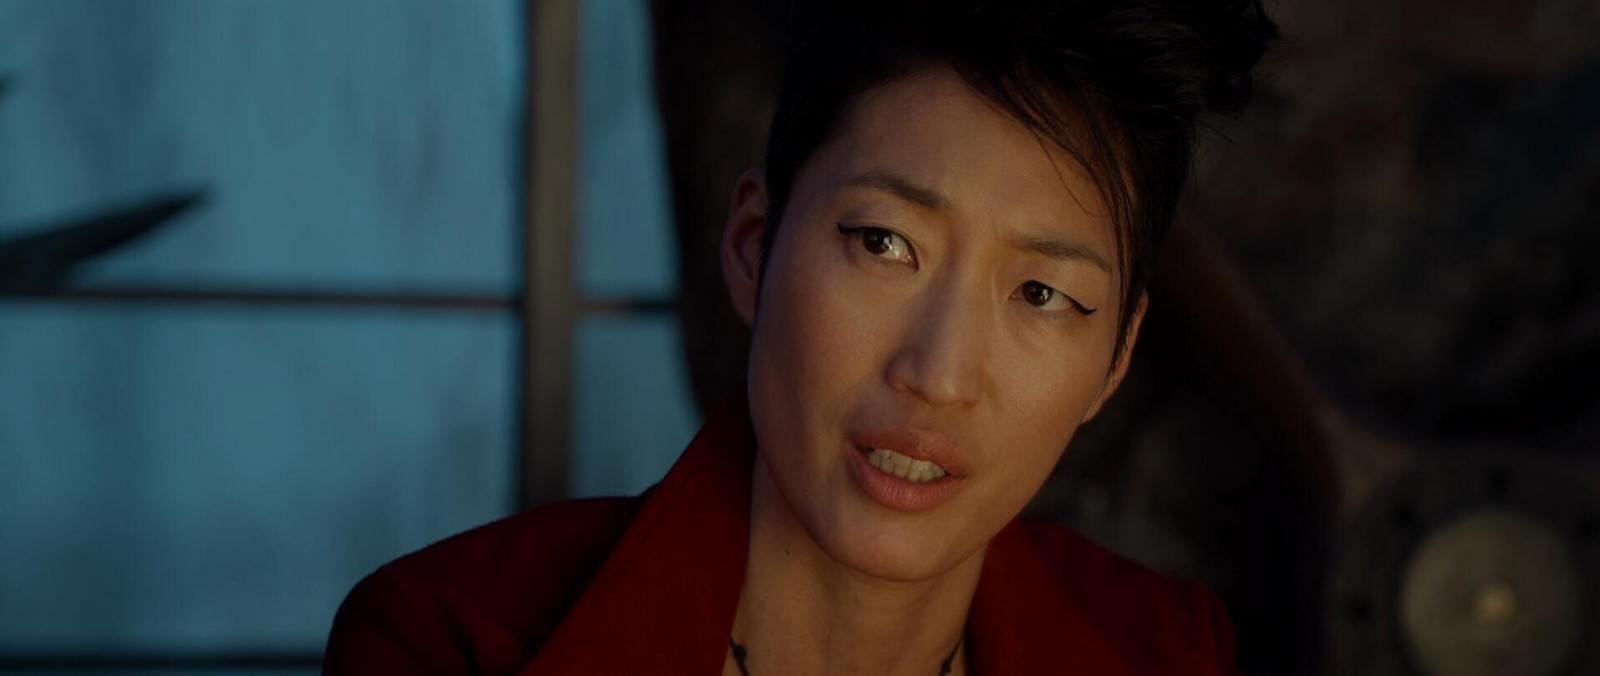 Movie, Mortal Engines(美國, 2018年) / 移動城市:致命引擎(台灣.香港) / 掠食城市(網路), 電影角色與演員介紹